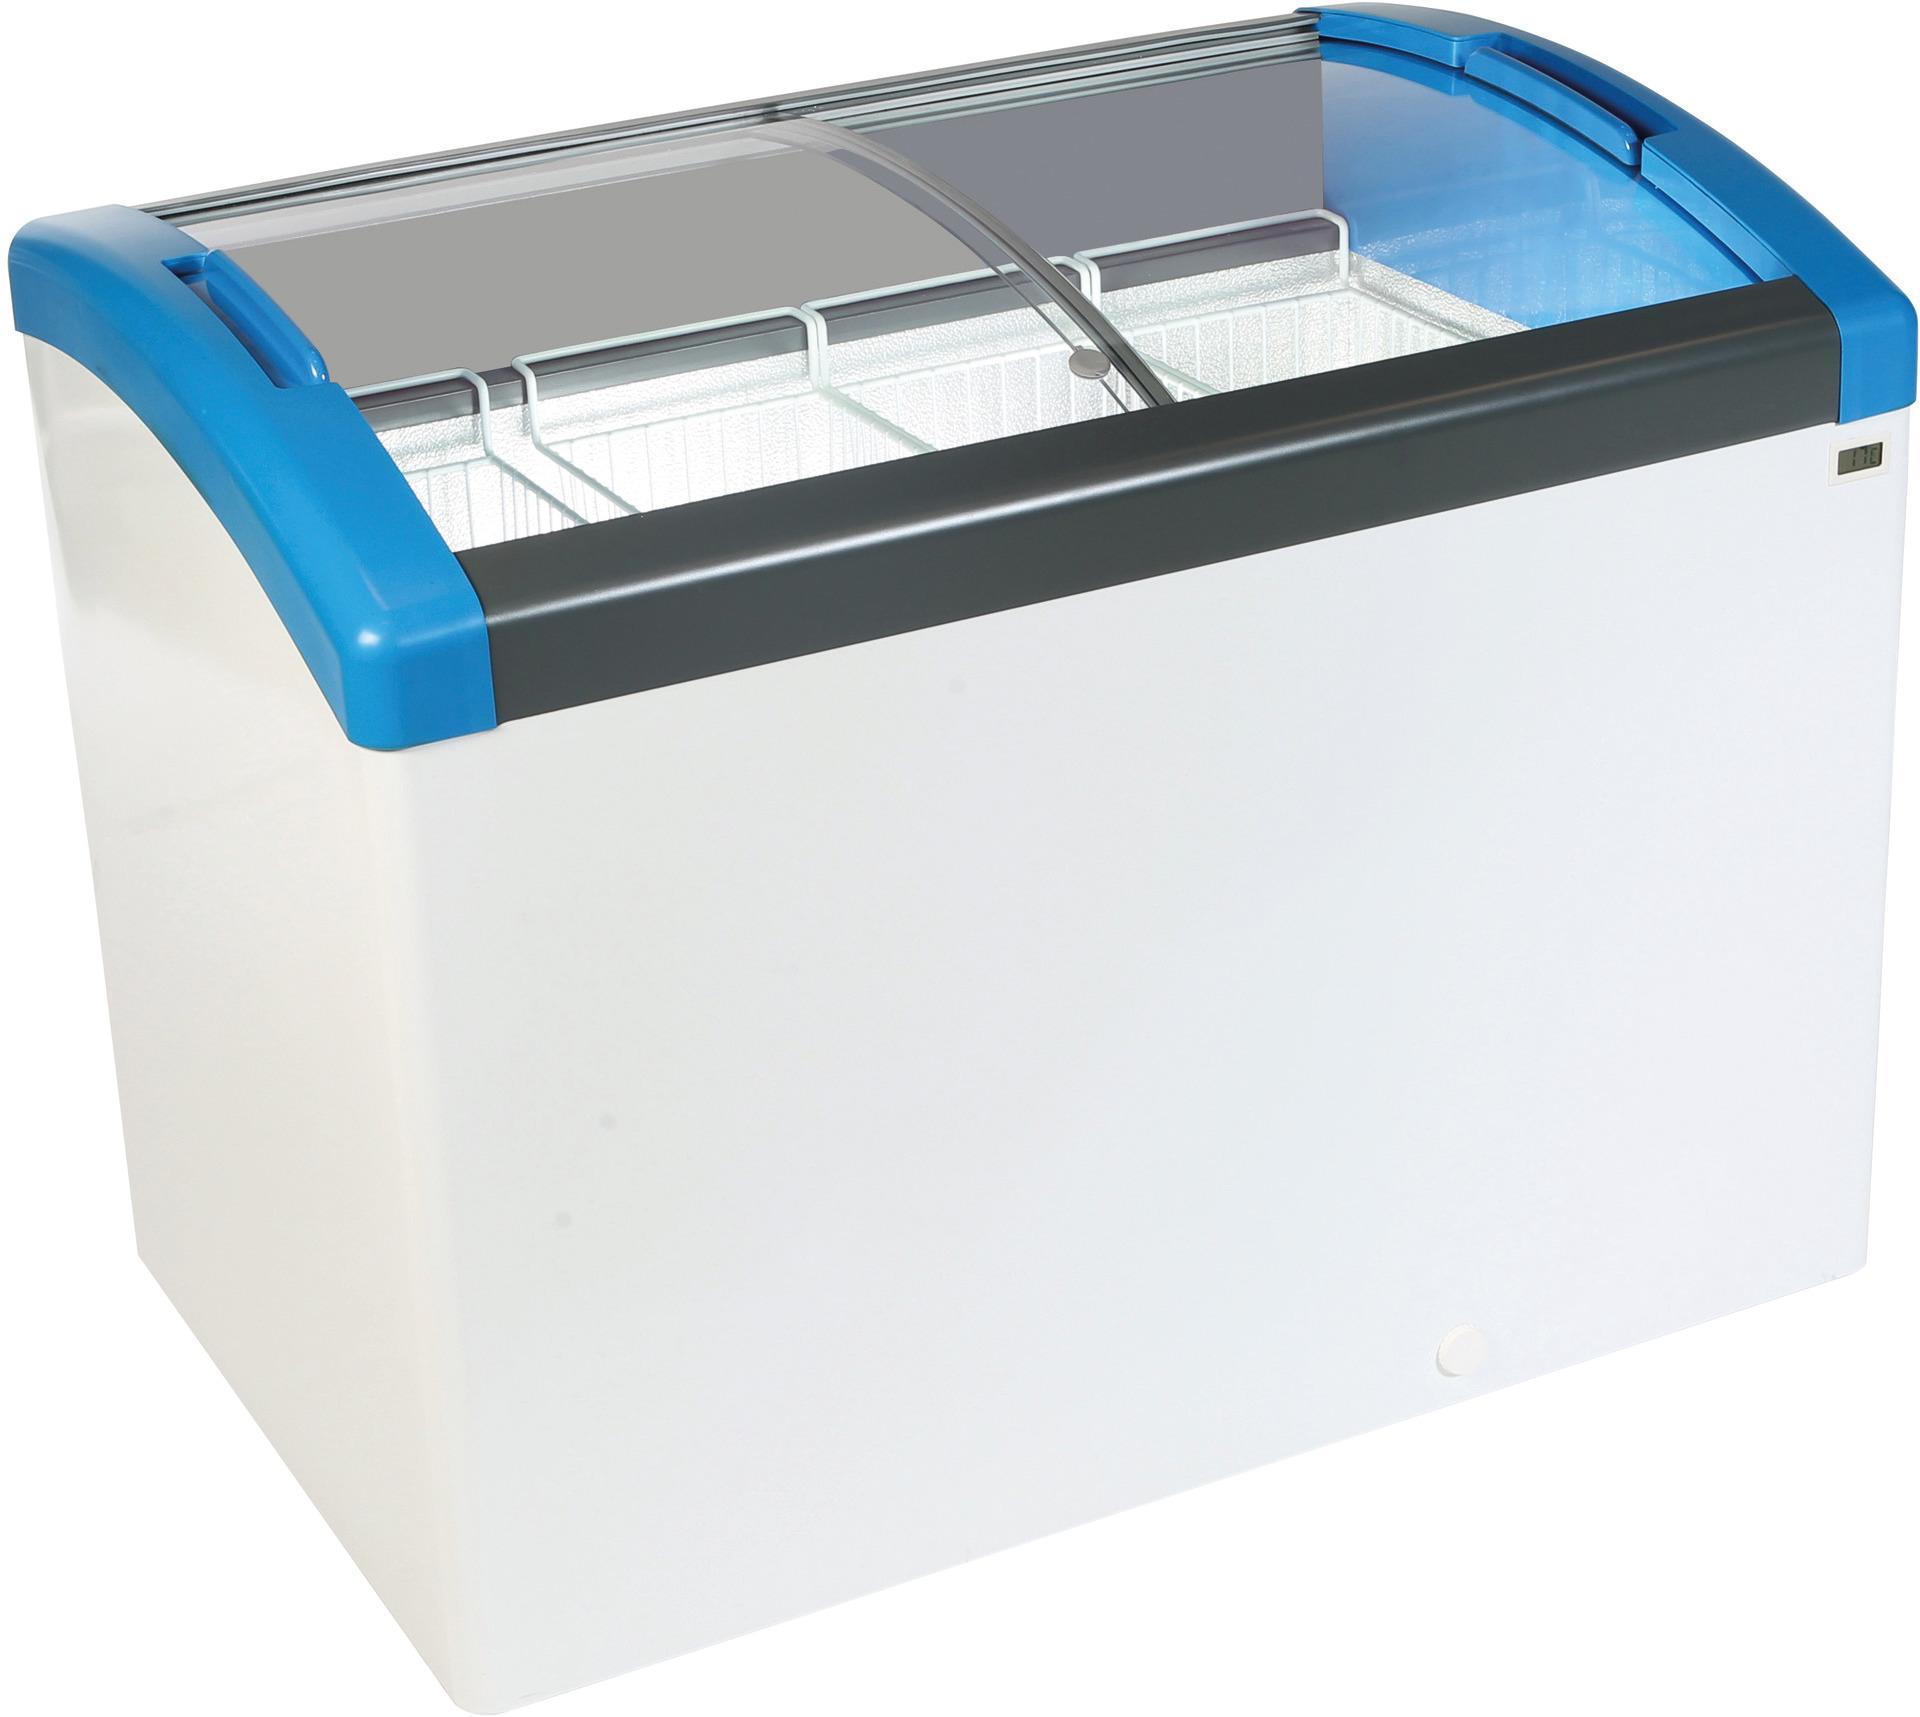 Kühl- / Tiefkühl-Impulstruhe 352,00 l  / für 5 Körbe / steckerfertig